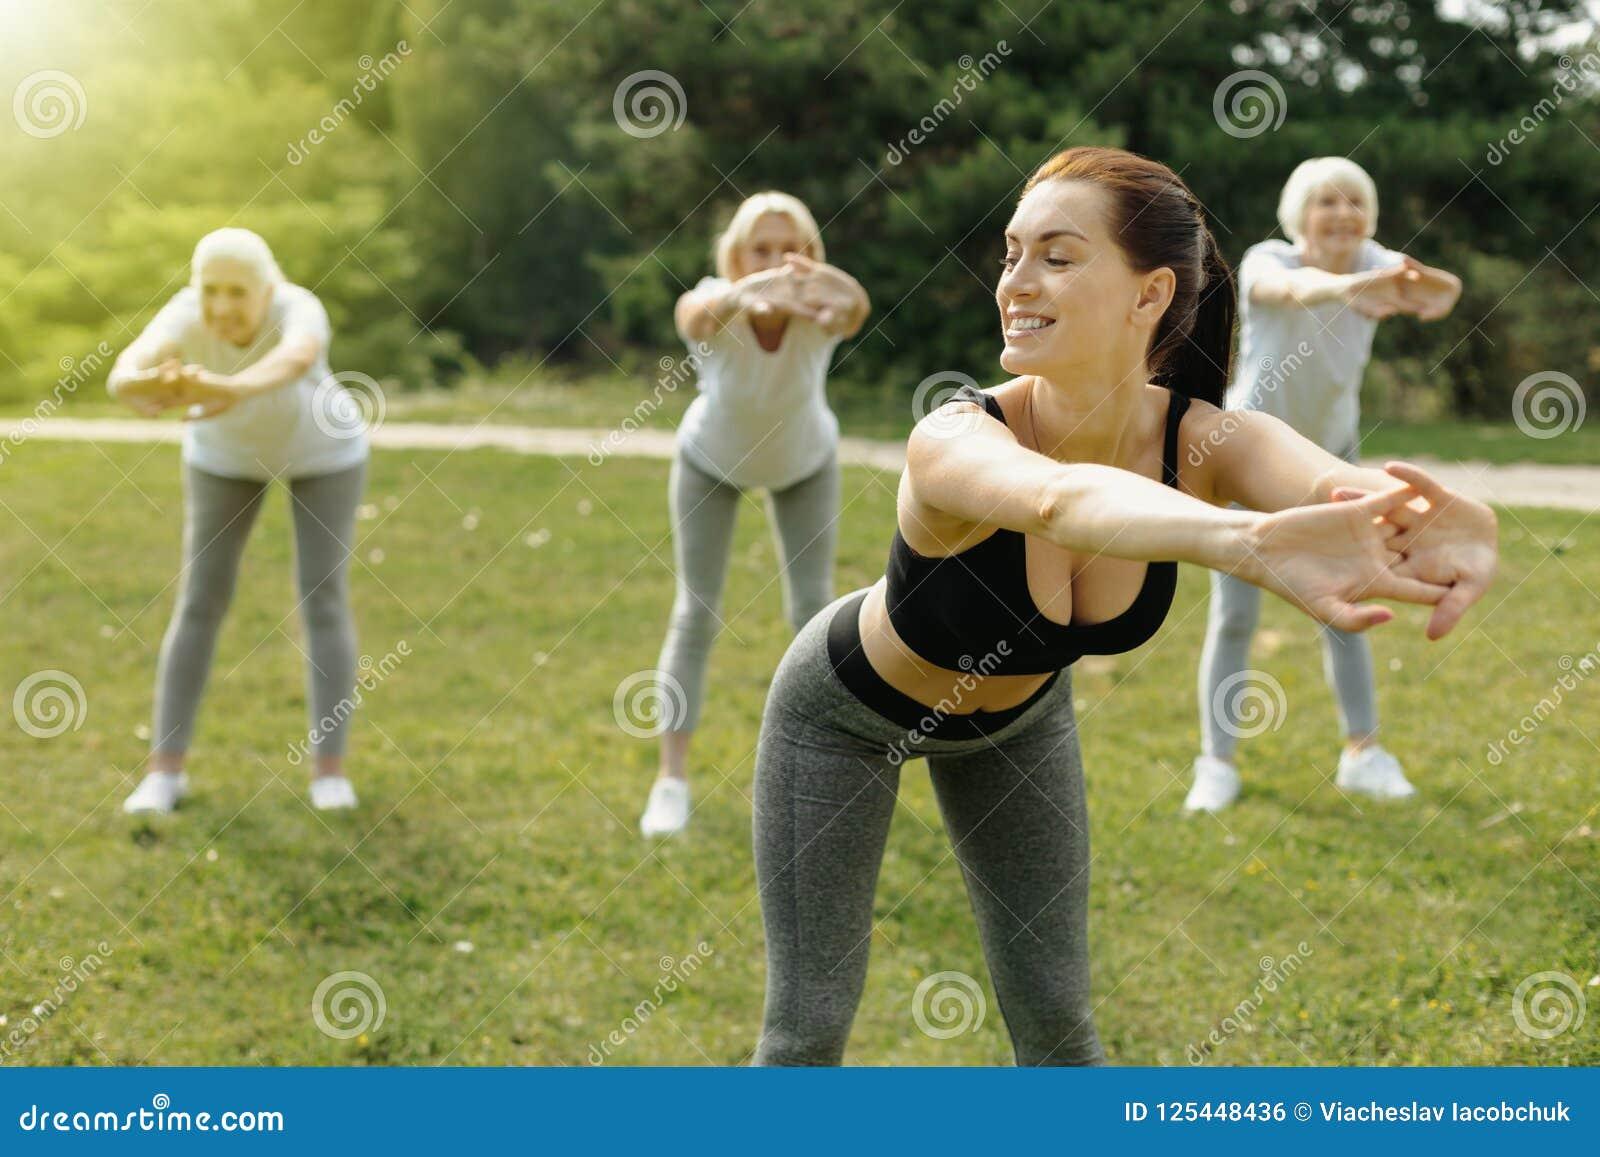 Positive minded woman training group of senior ladies